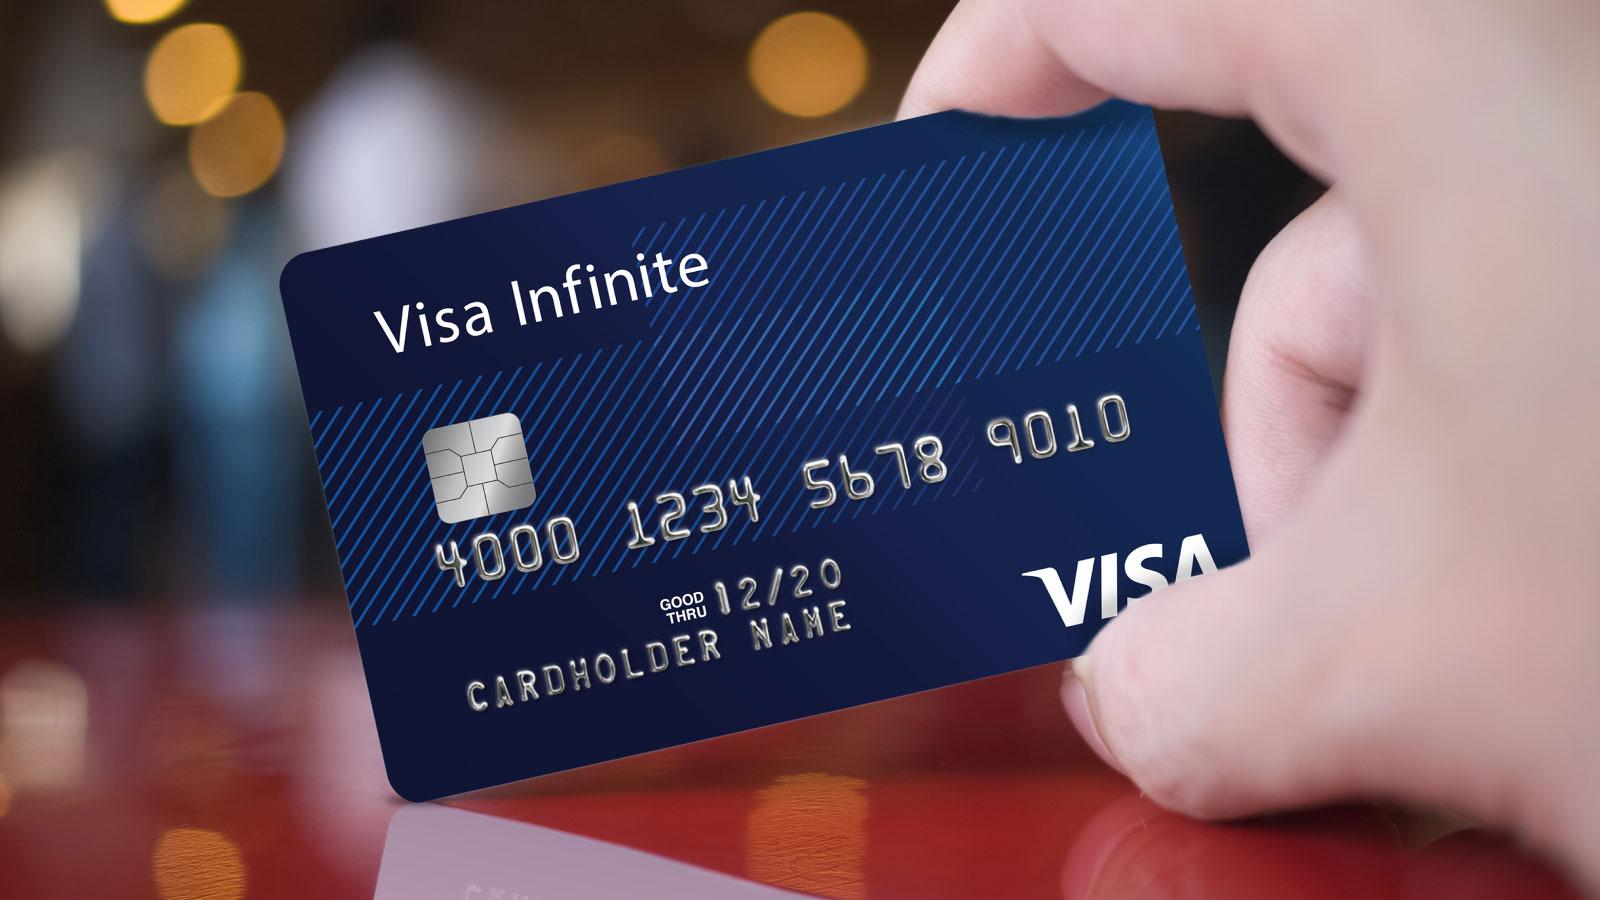 Visa Infiniteカード特典   Visa